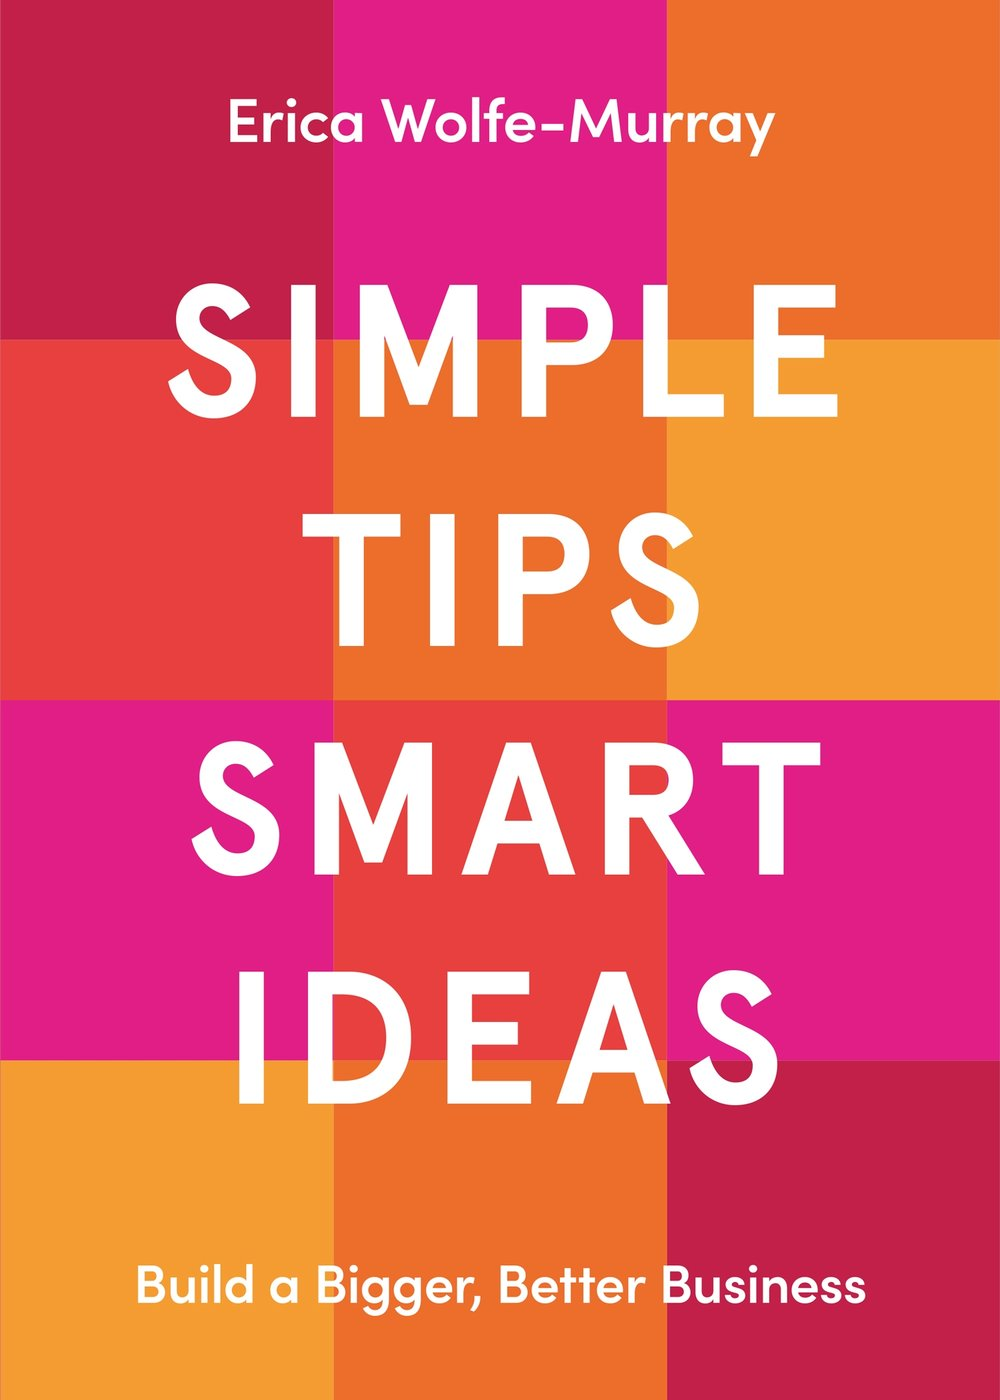 759-LOLA-MEDIA-Simple-Tips,-Smart-Ideas-Cover_V6_front.jpg